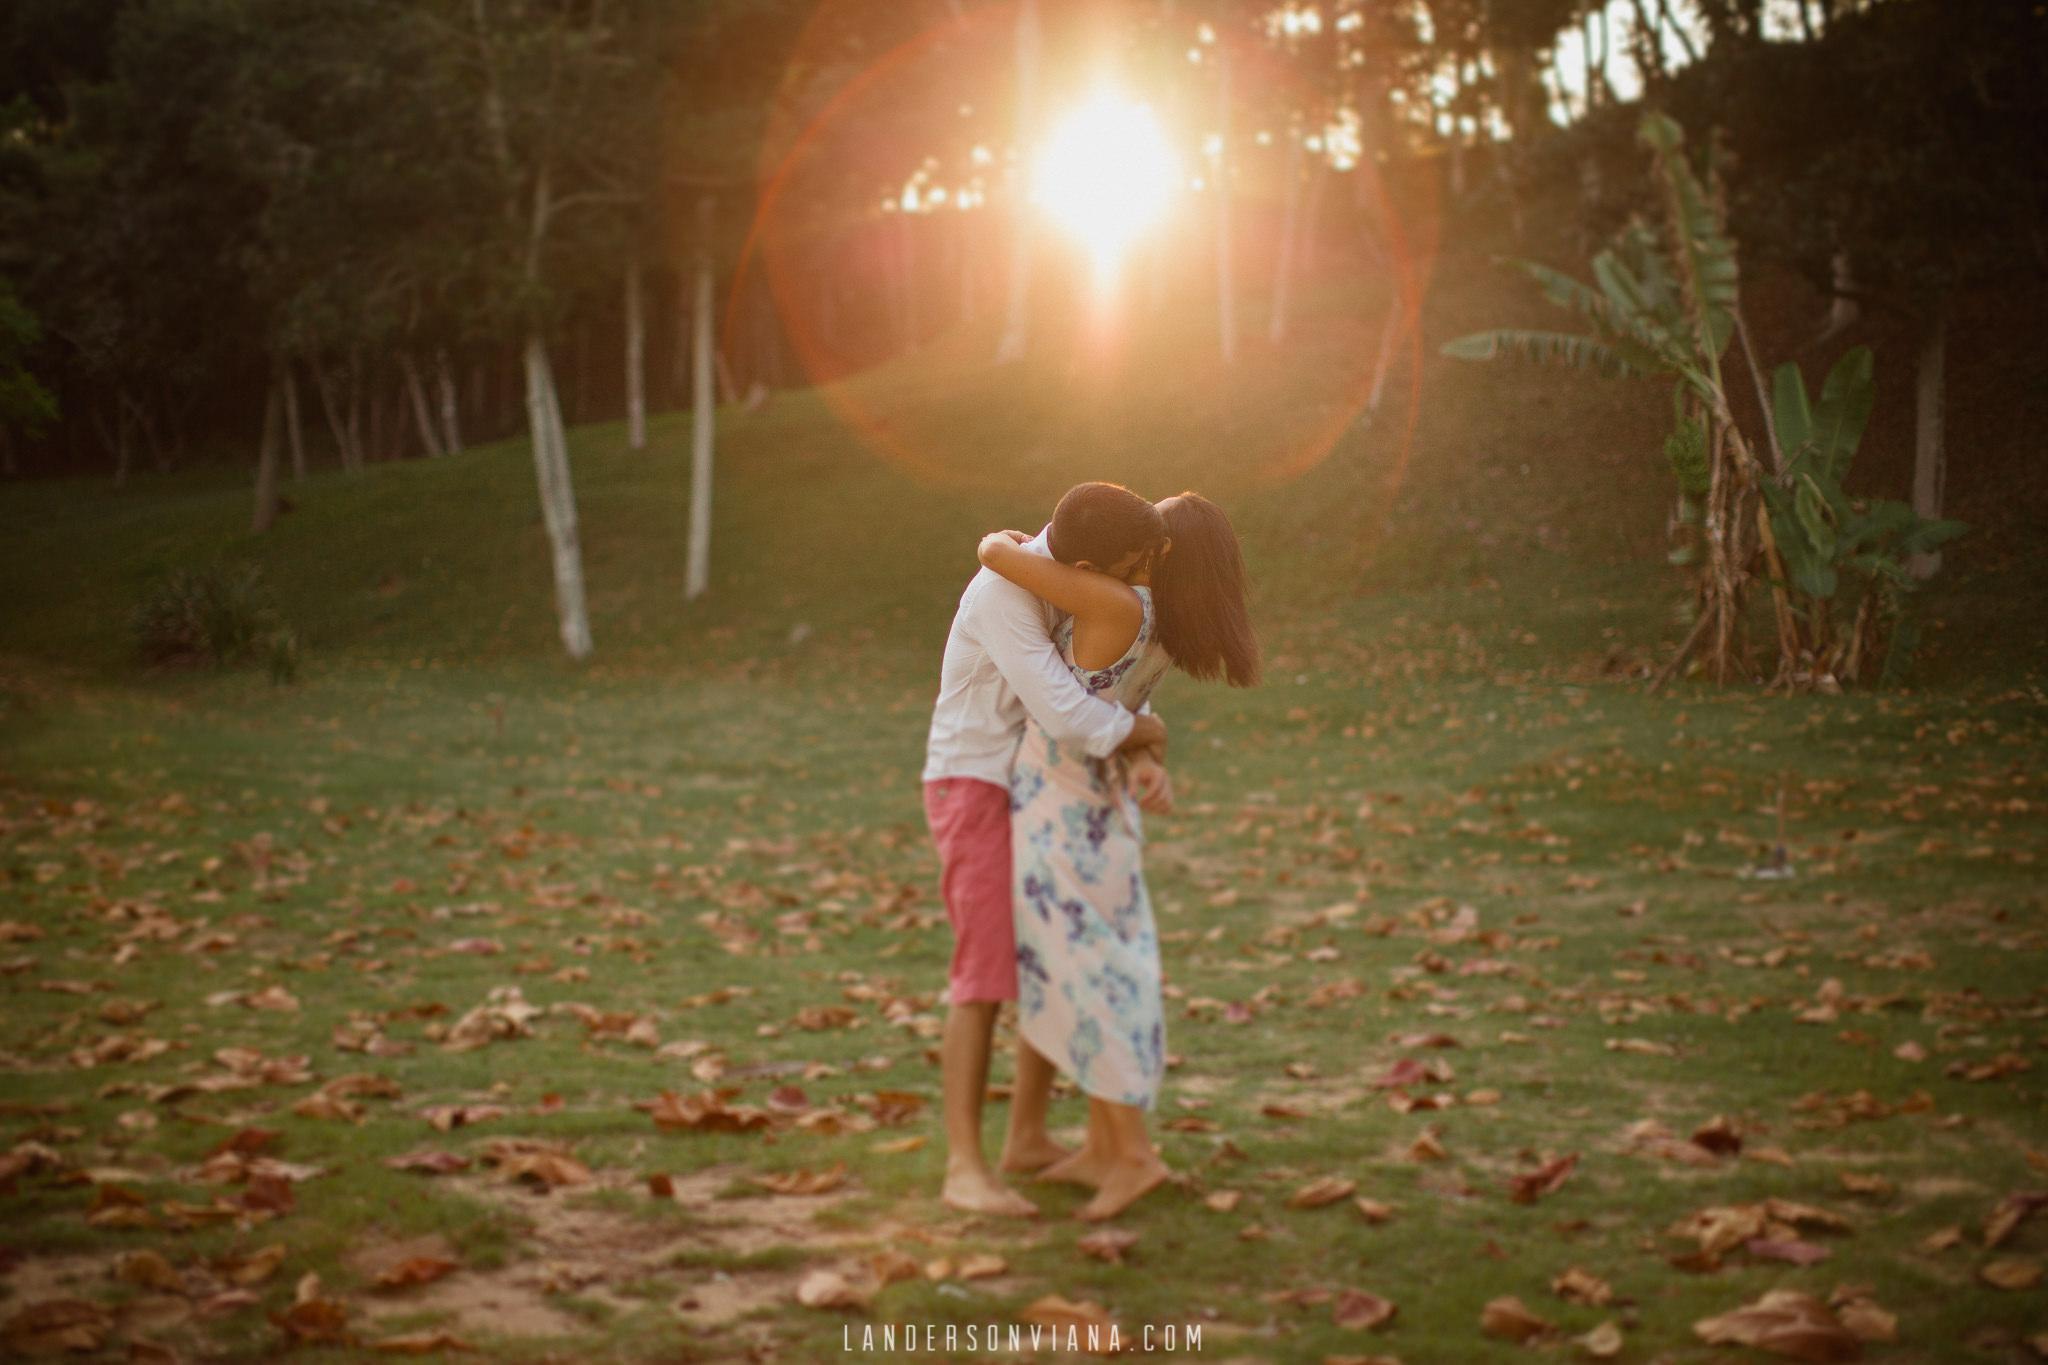 ensaio-pre-wedding-praia-landerson-viana-fotografia-casamento-pegueiobouquet-7.jpg